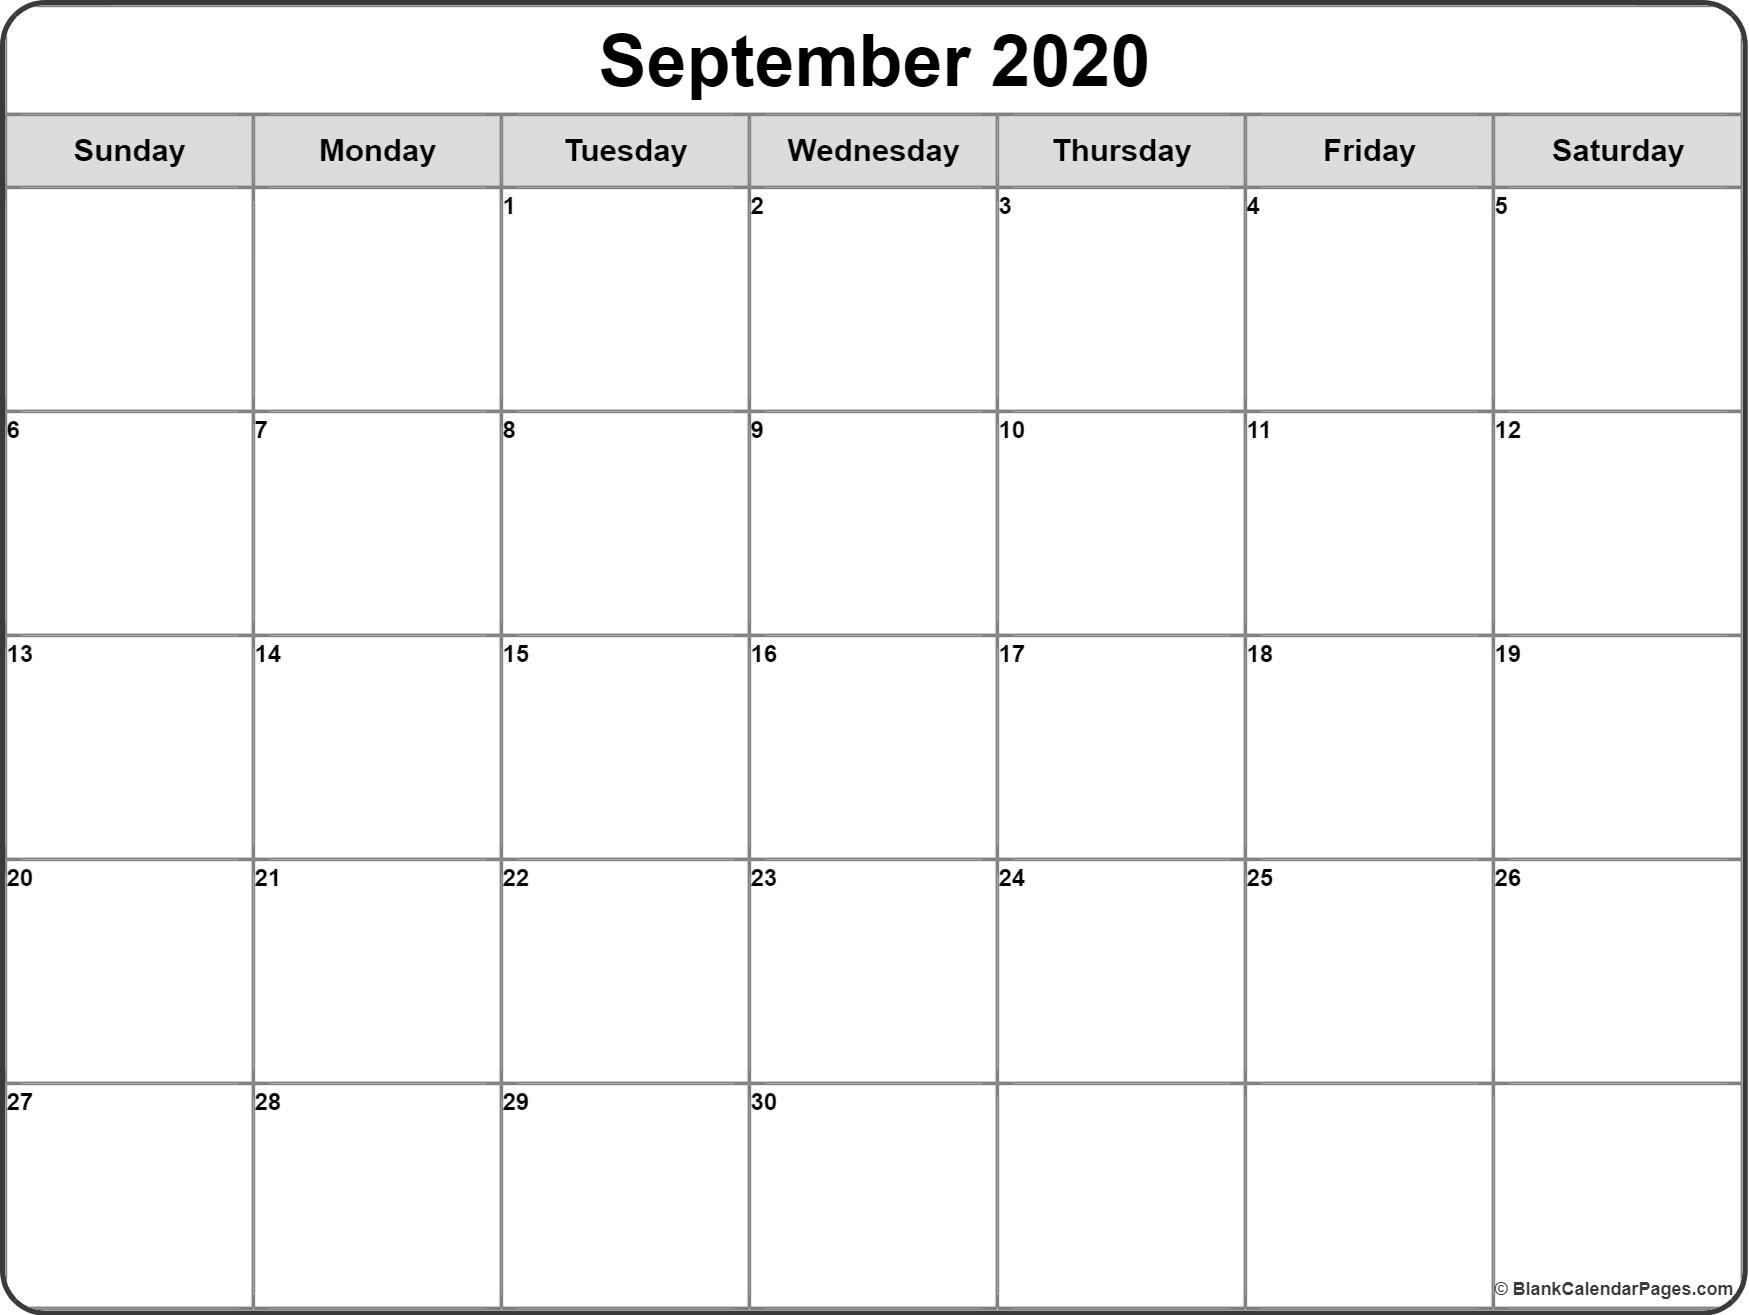 September 2020 Calendar | Free Printable Monthly Calendars inside 2020 Free Monthly Printable Calendars